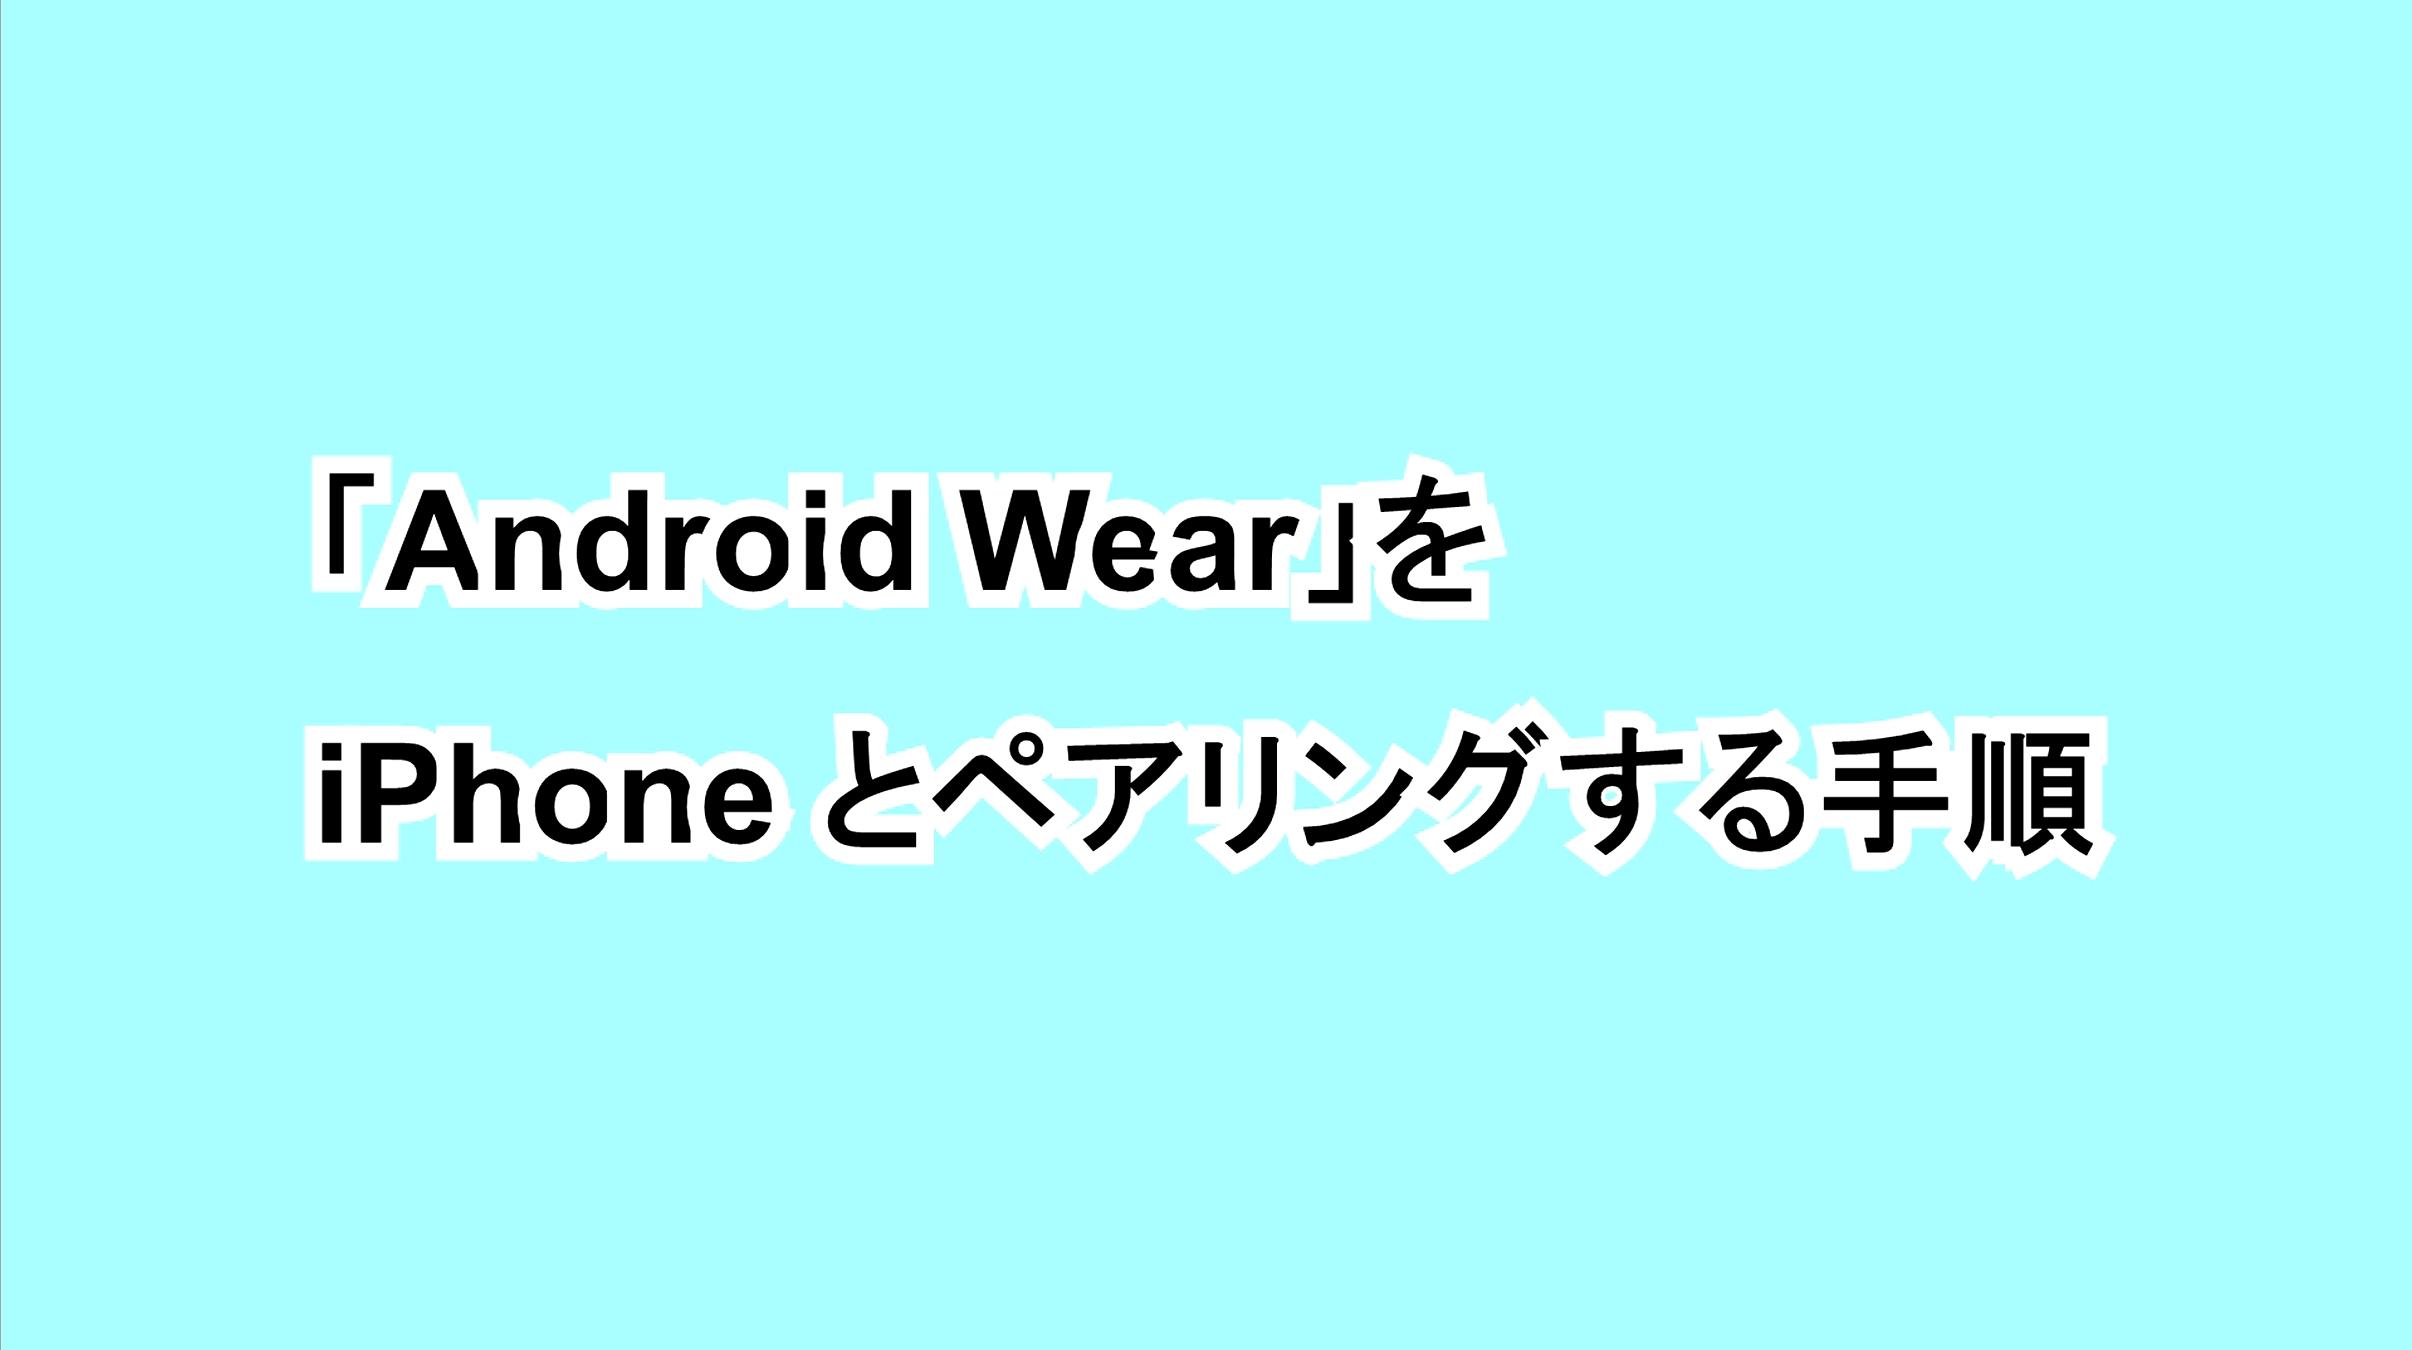 「Android Wear」をiPhoneとペアリングする手順